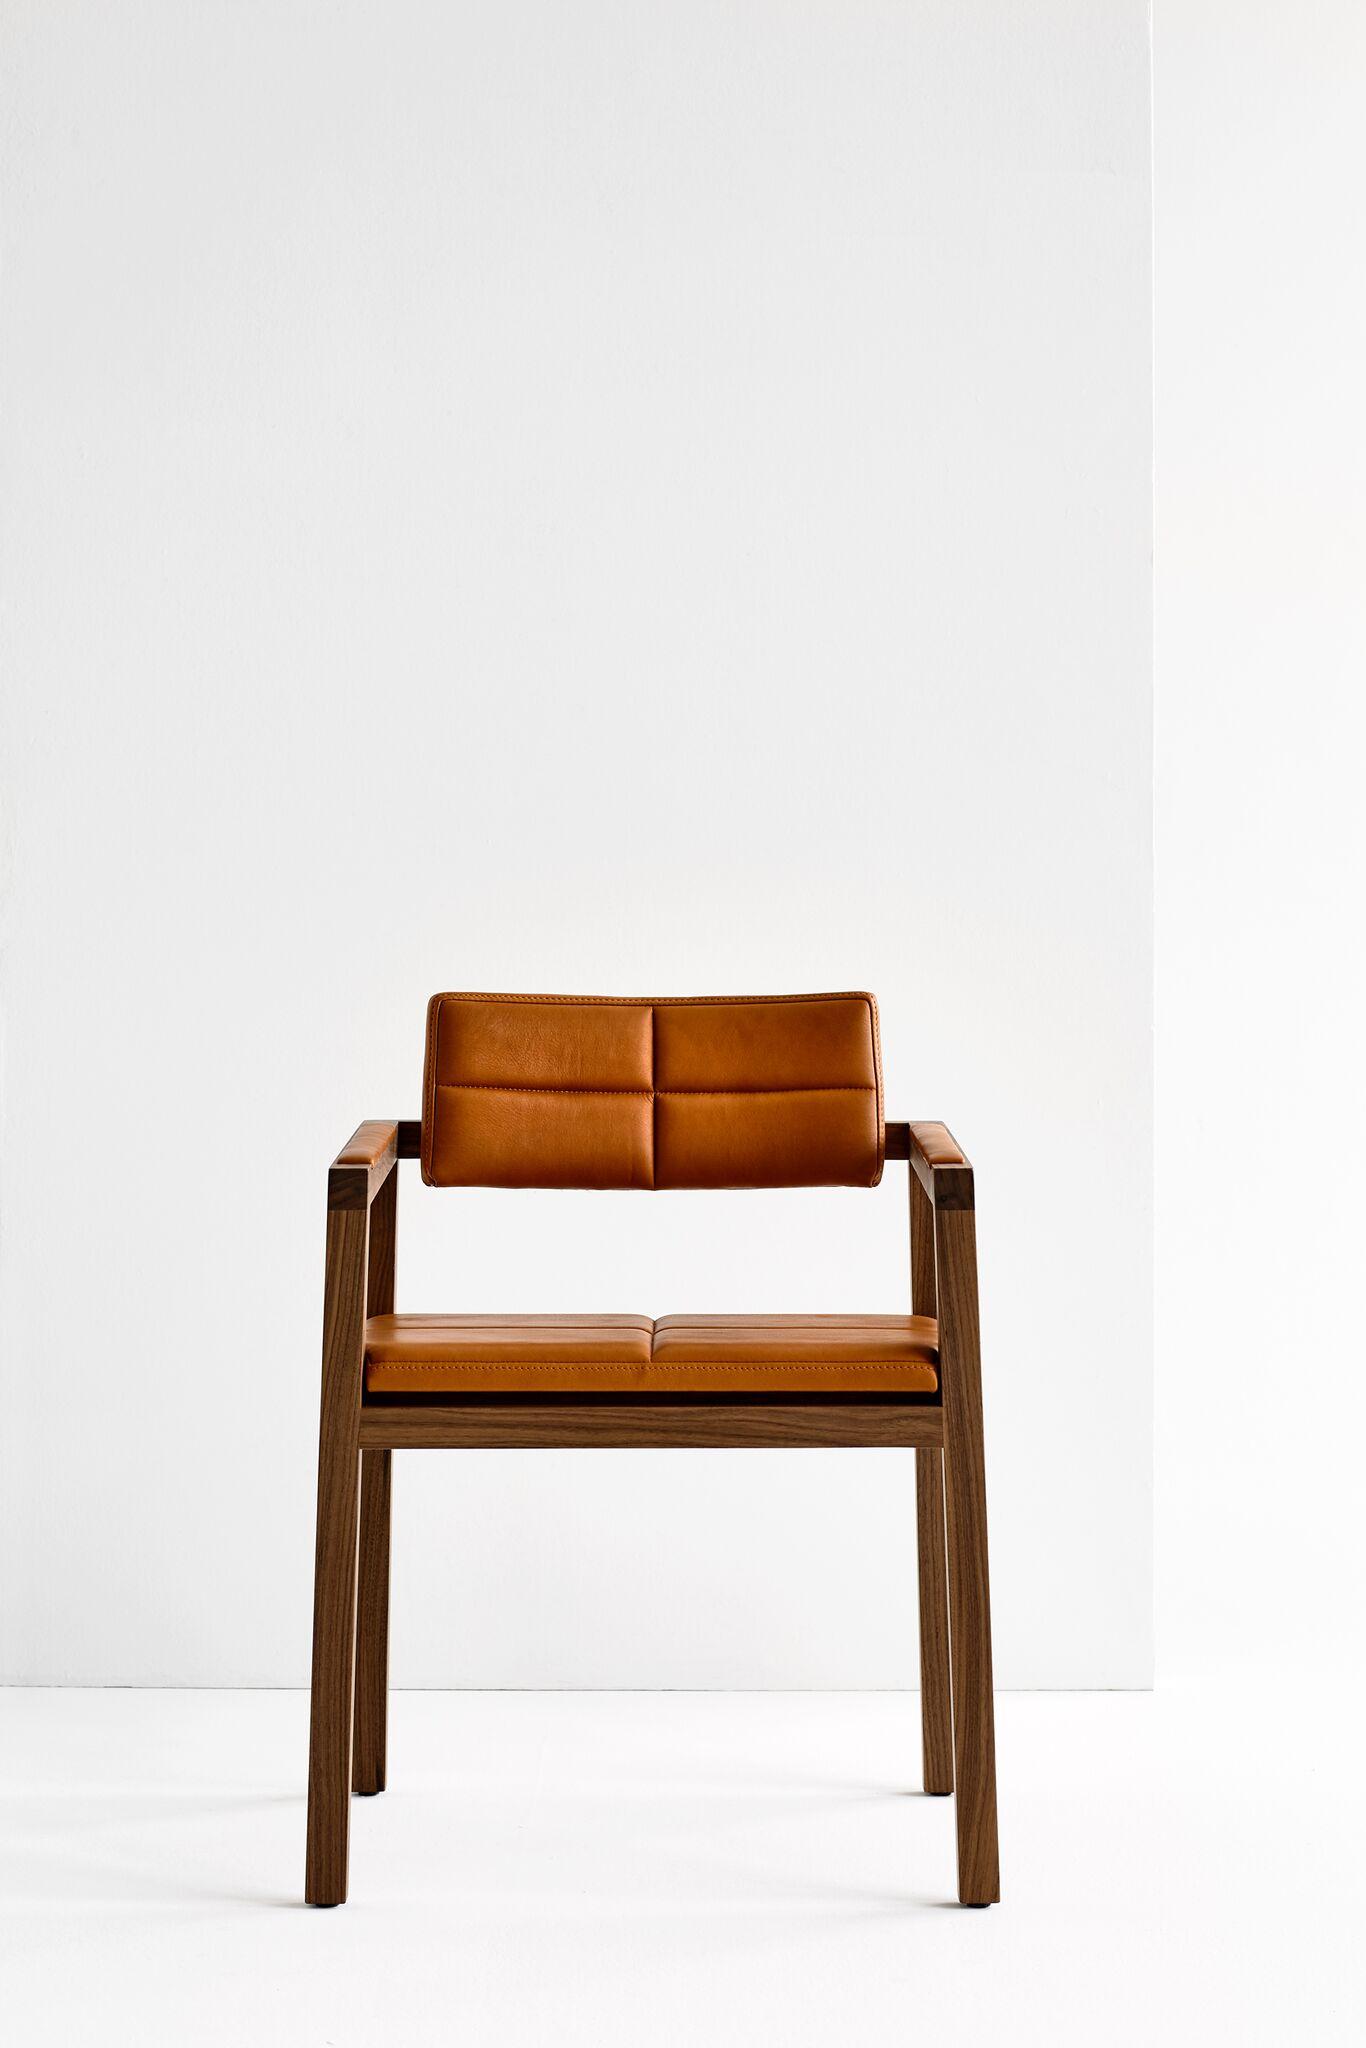 Gallery Of Mila Chair By Franco Crea Local Australian Furniture Designer & Maker Richmond, Melbourne Image 3